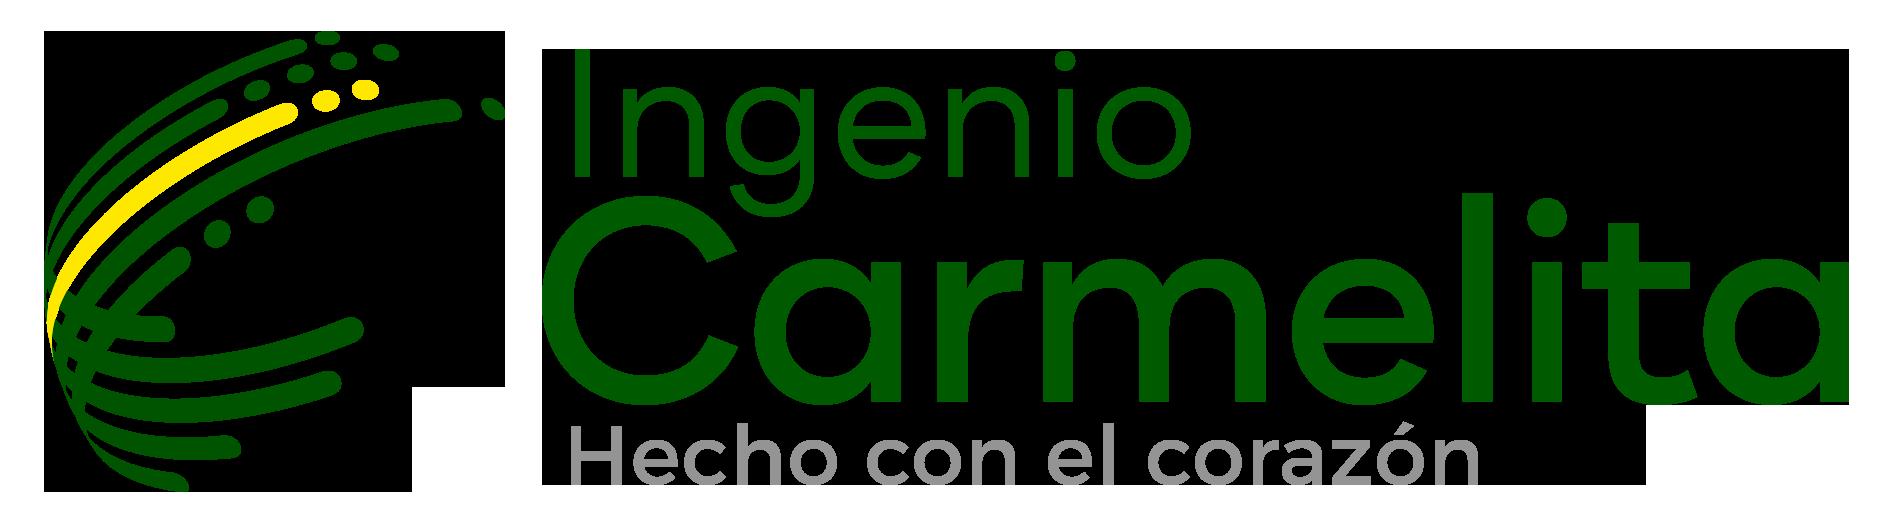 logoCarmelitaWeb2019Header-1